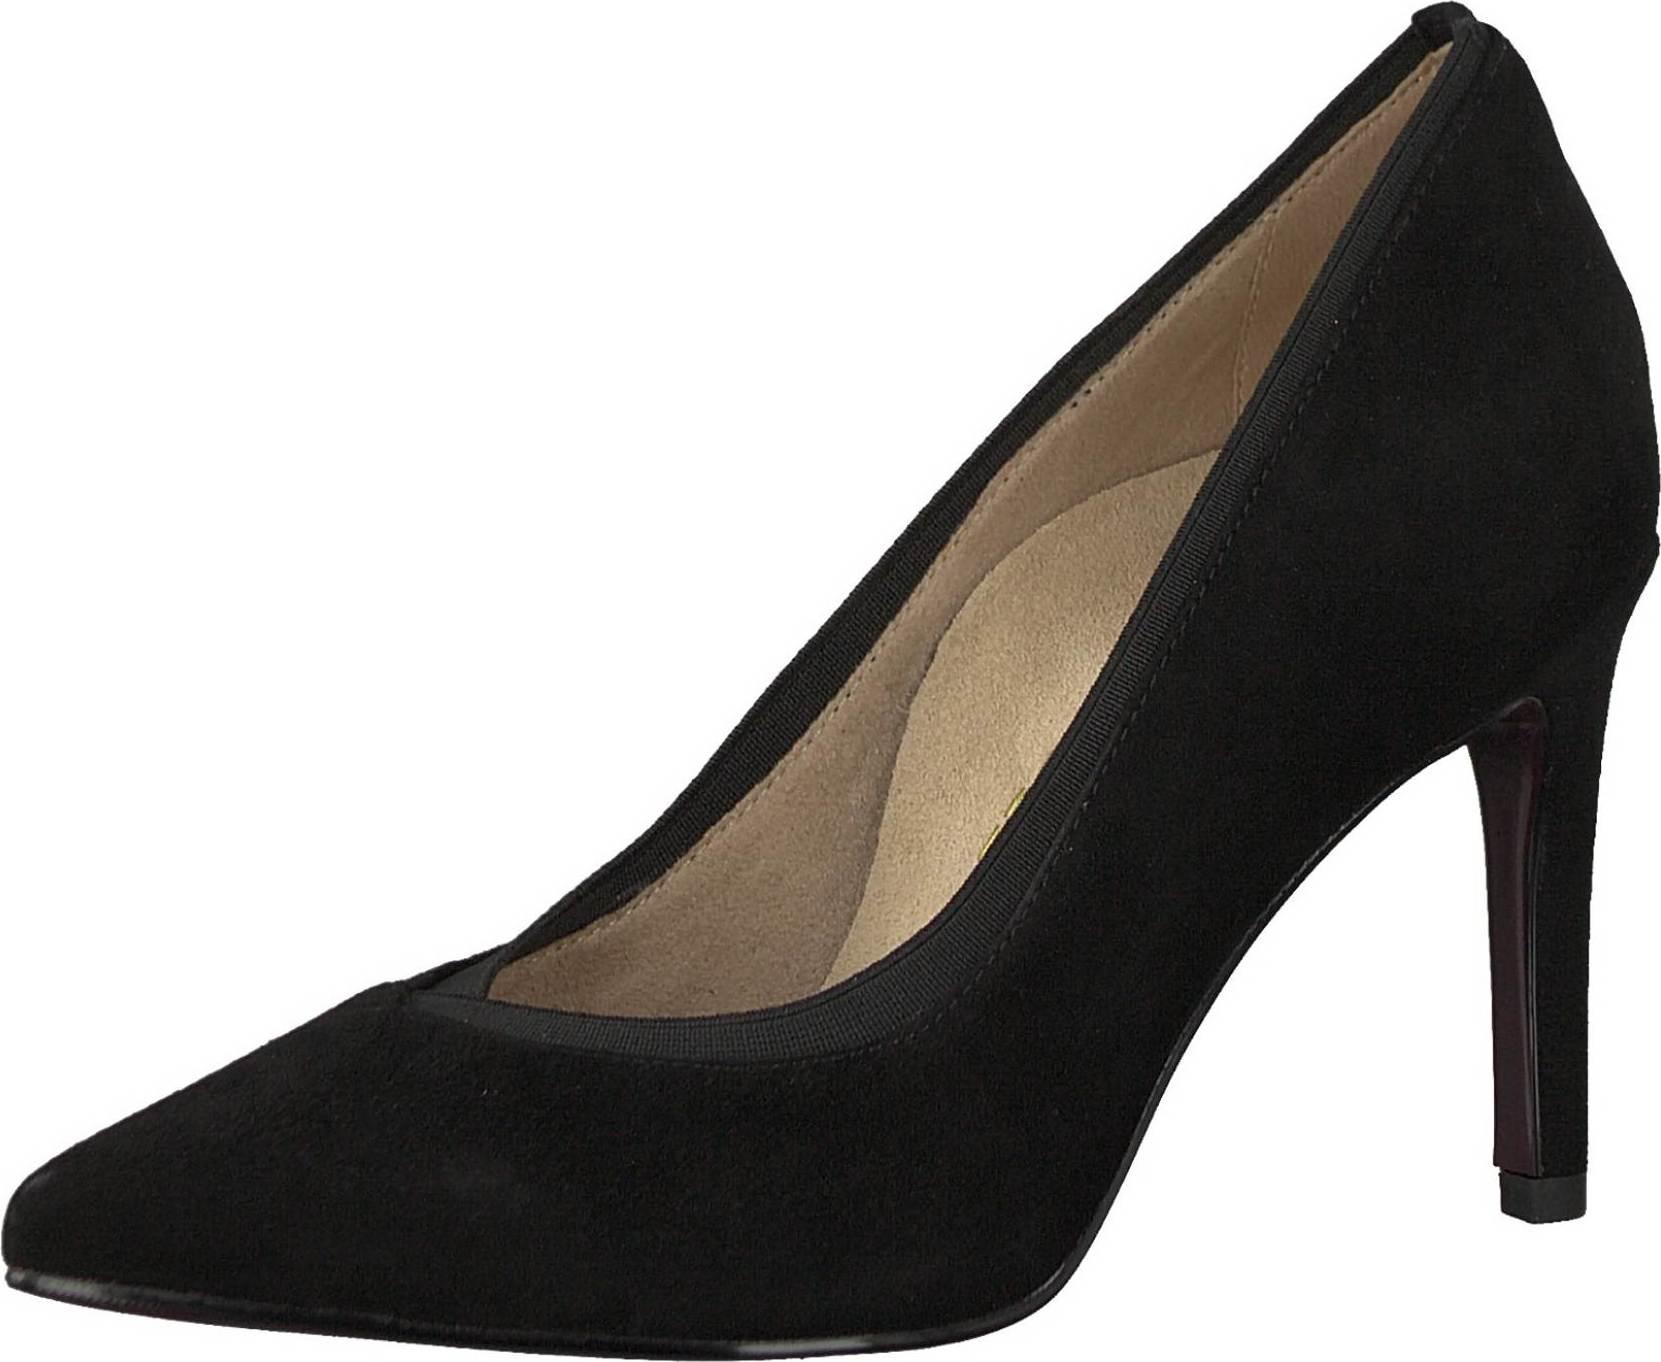 Dámská obuv TAMARIS 1-1-22440-21 BLACK 001 – E-shop Tamaris 87d34bf0be